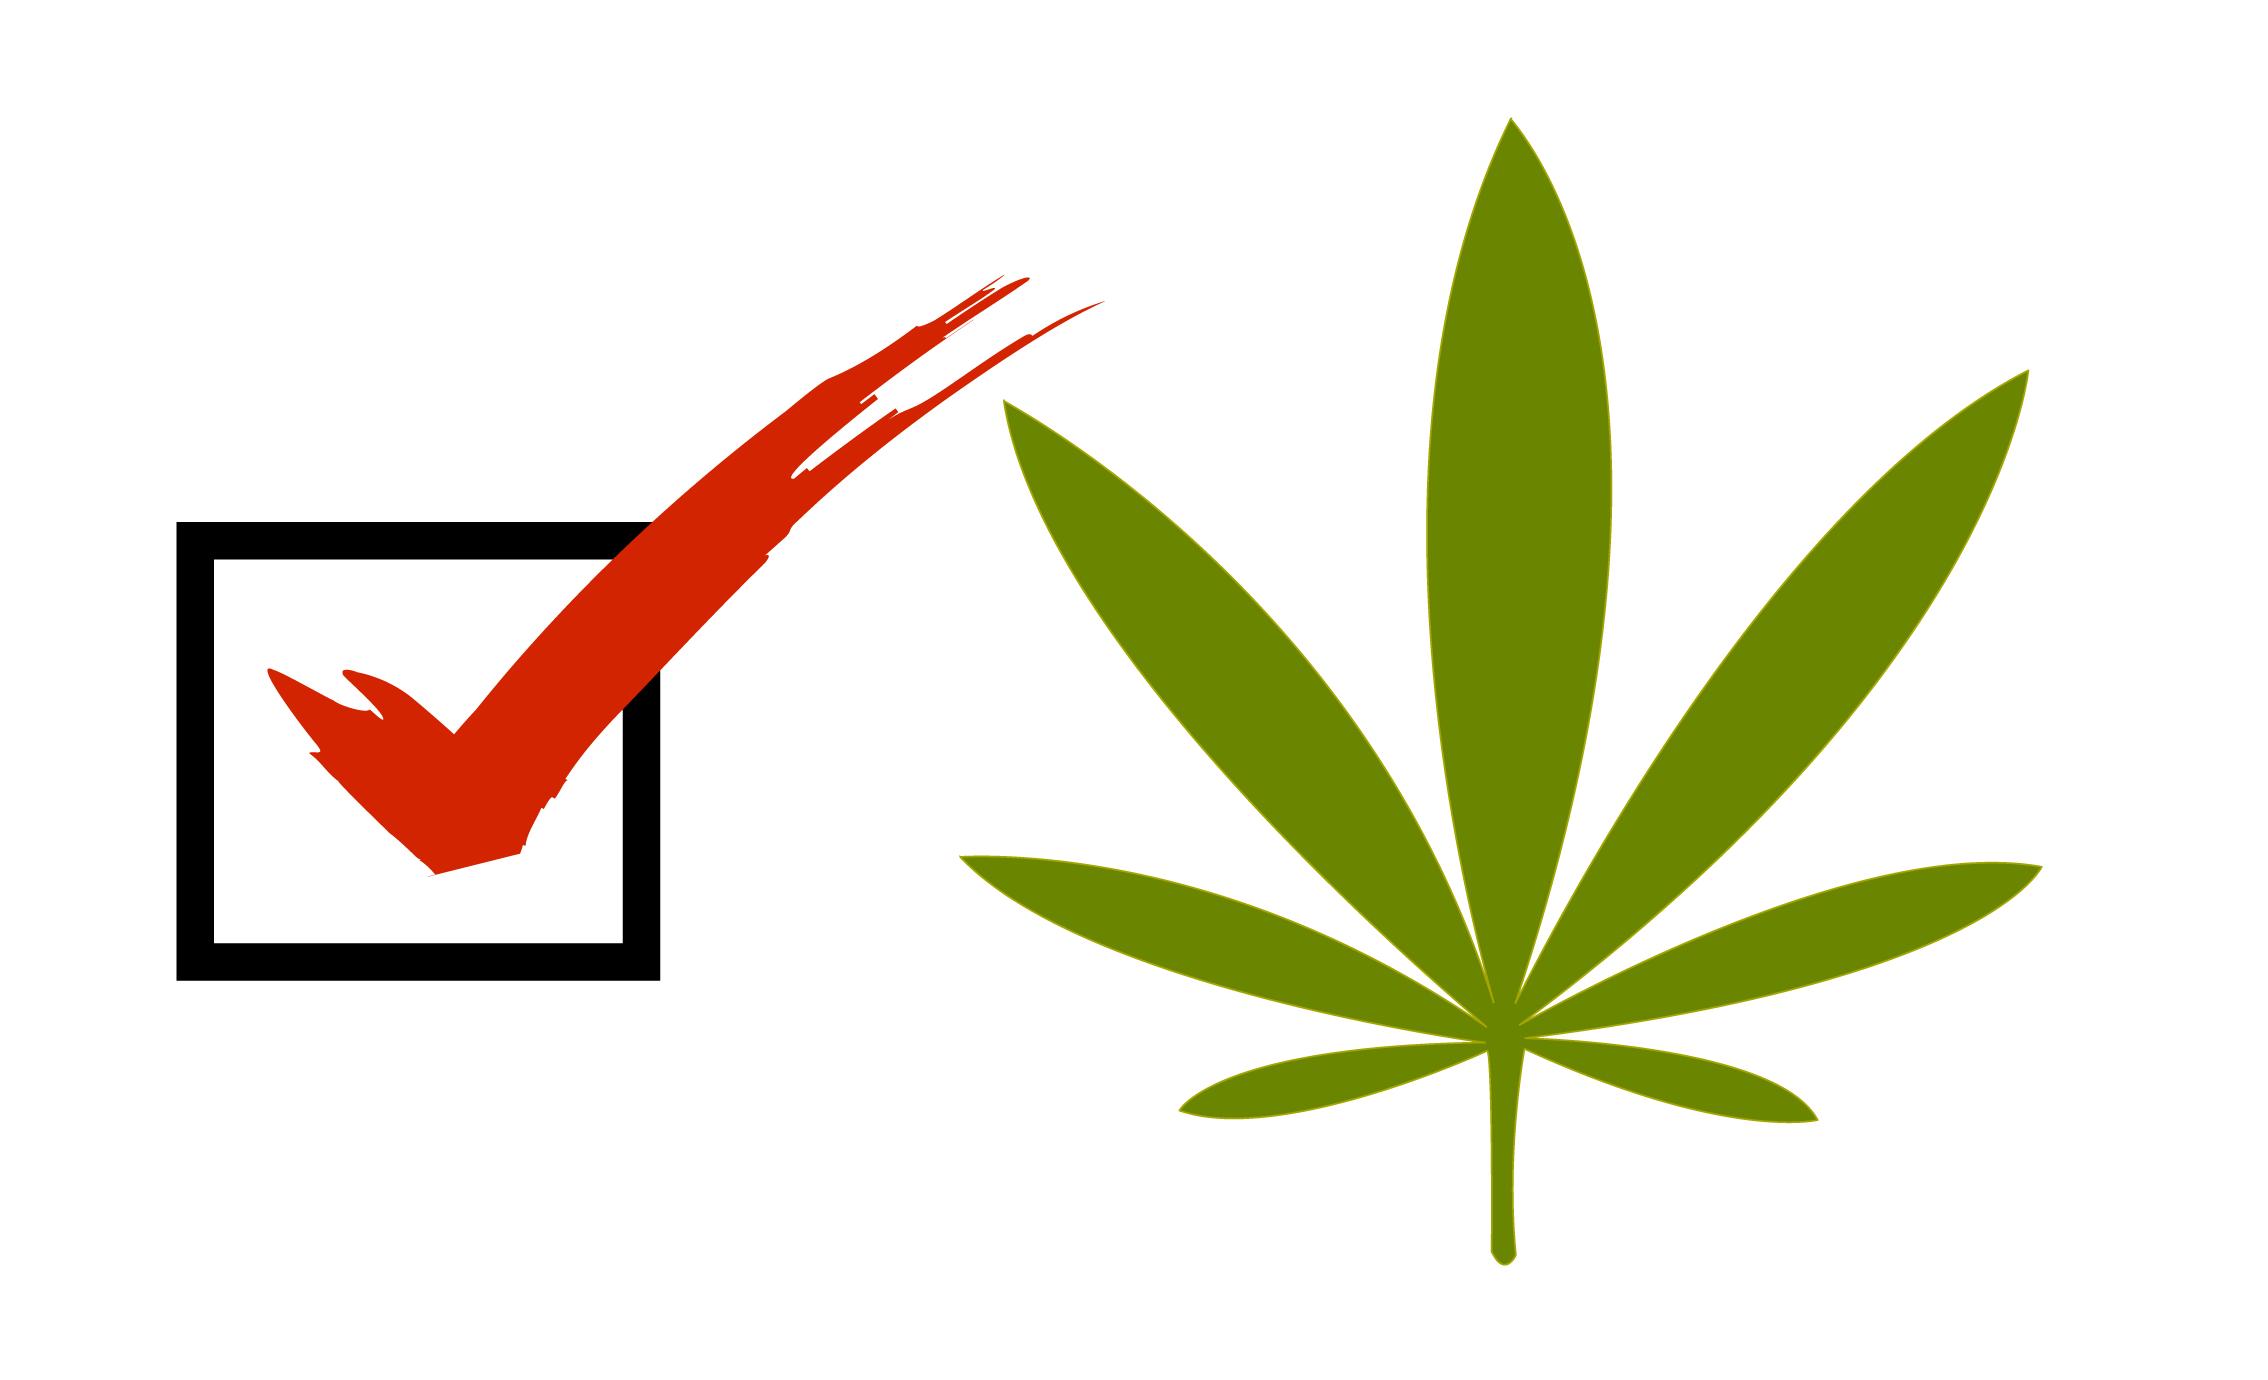 alaska-legalizes-recreational-marijuana